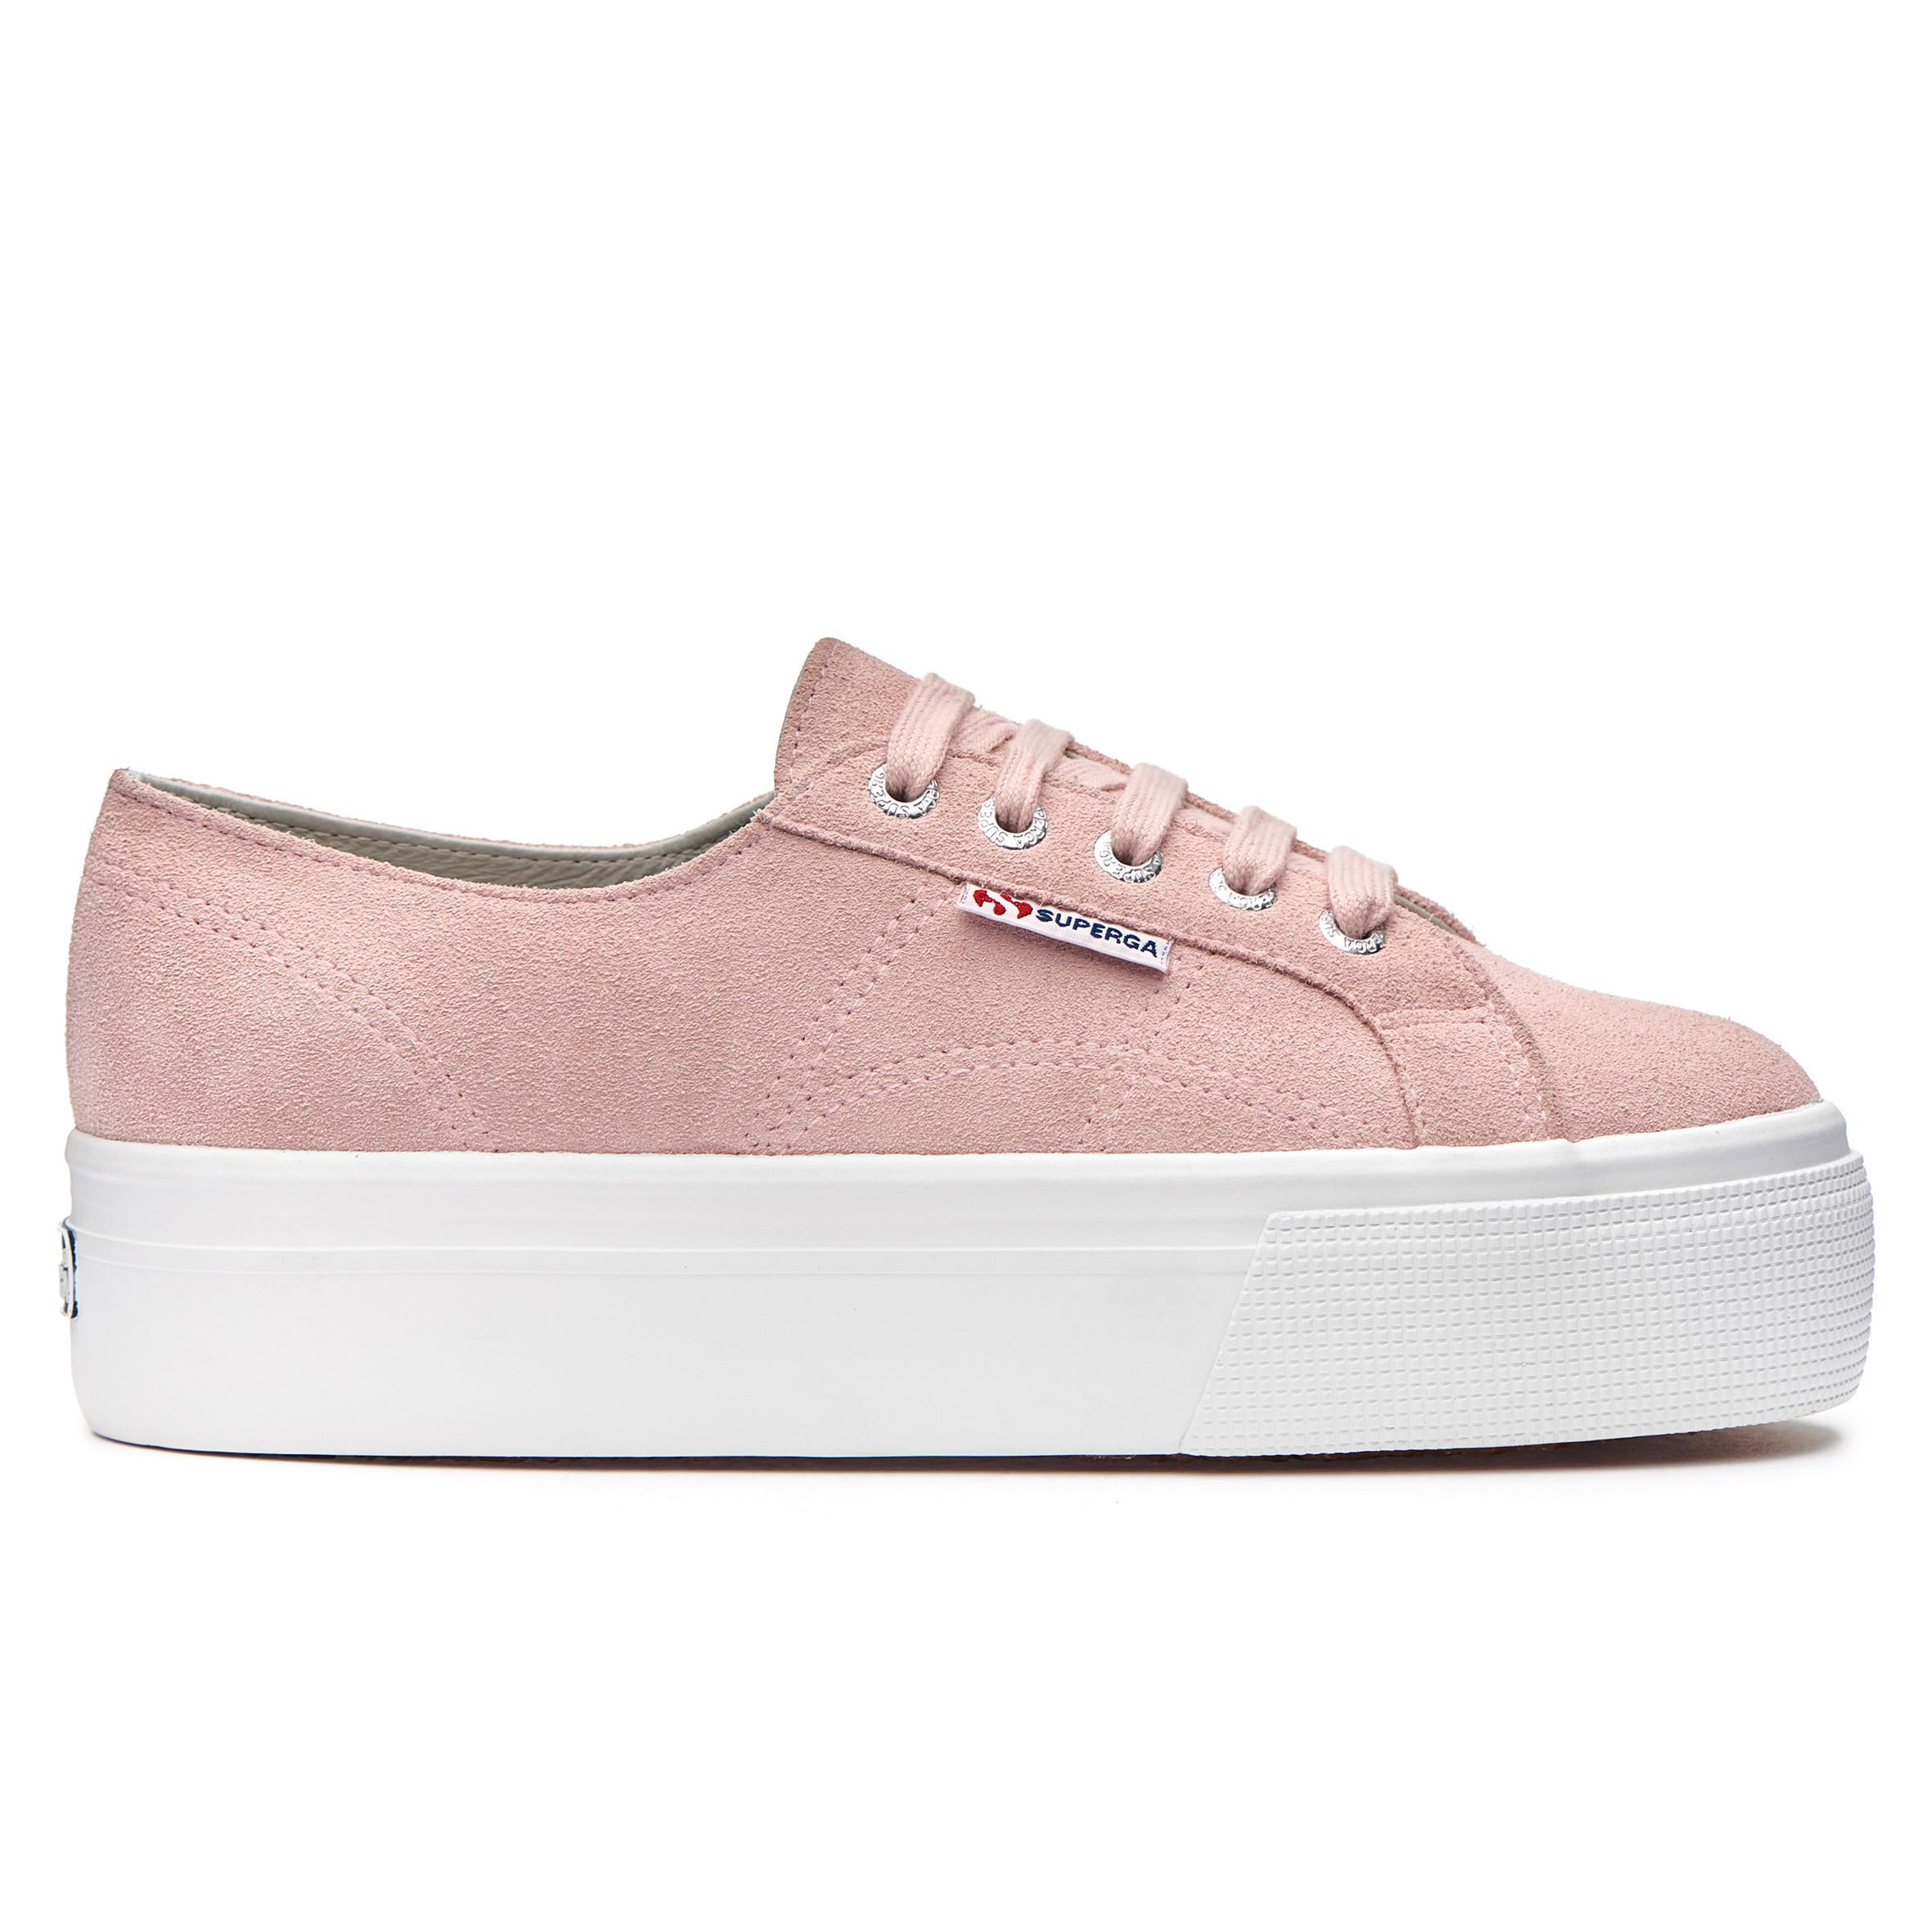 b384d52e0a2 2790 SUEW Pink Skin 2790 SUEW Pink Skin ...